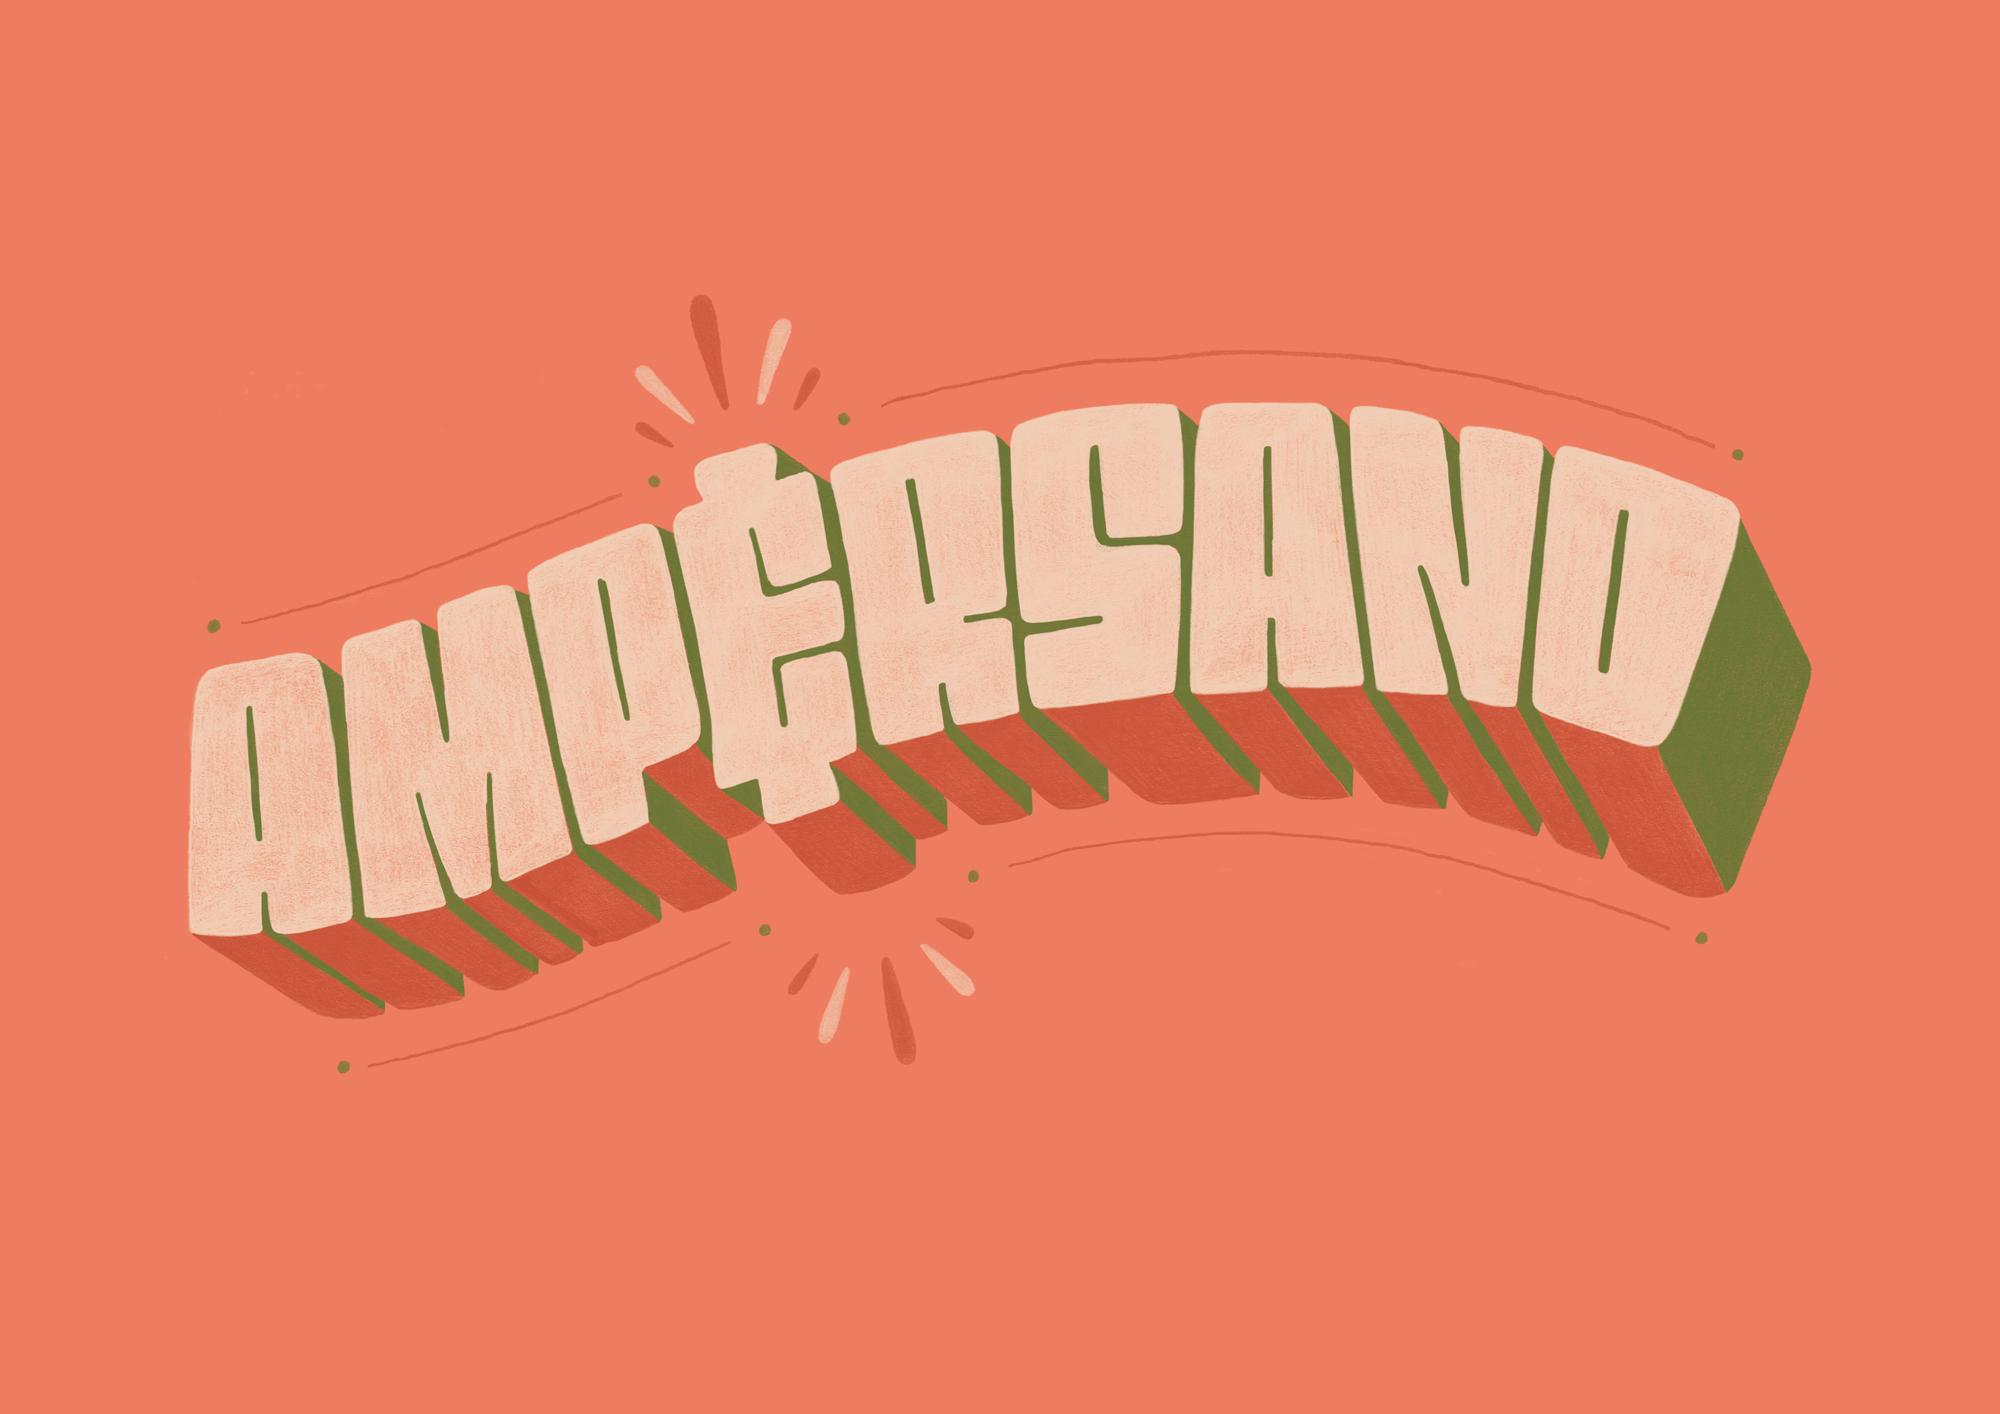 Ampersand-3_CaseySchuurman.png